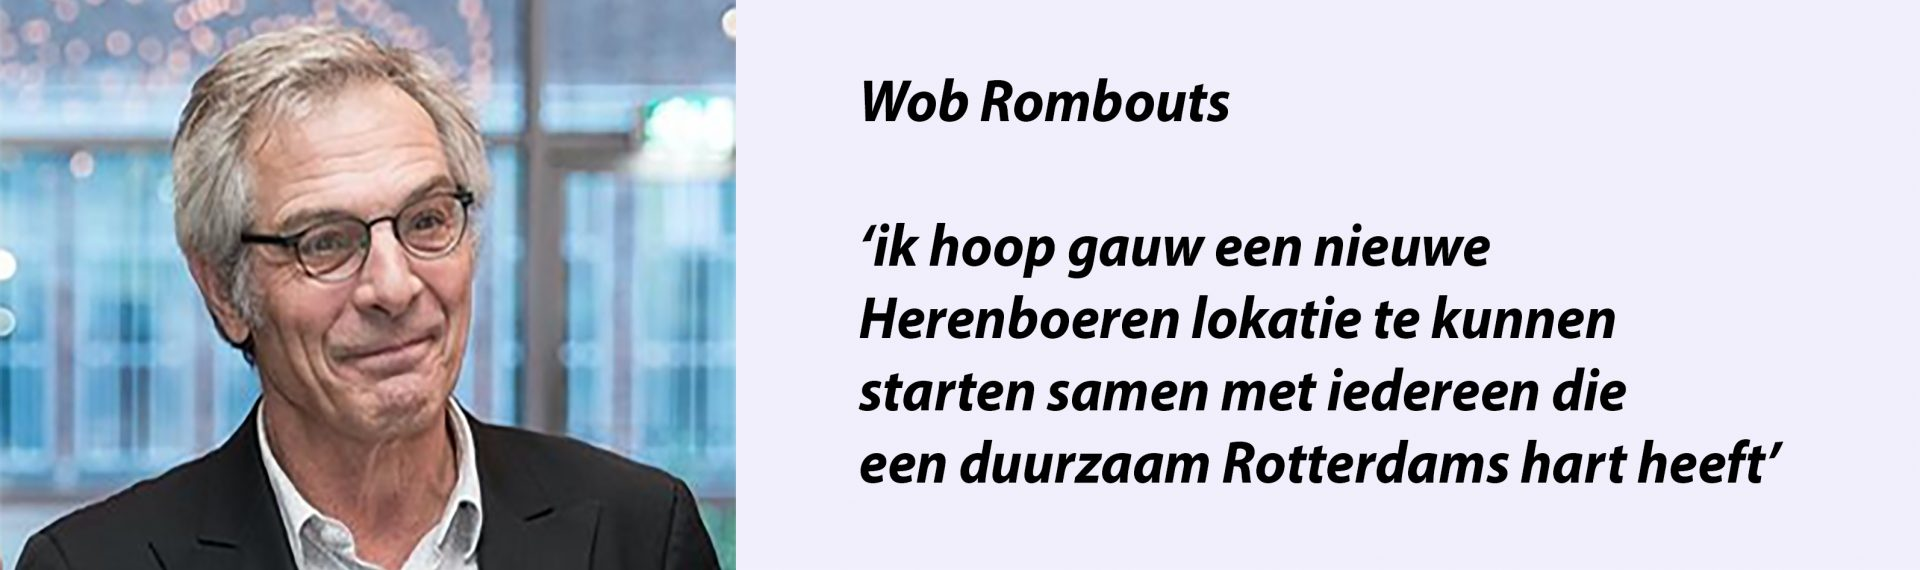 WobRombouts + tekst